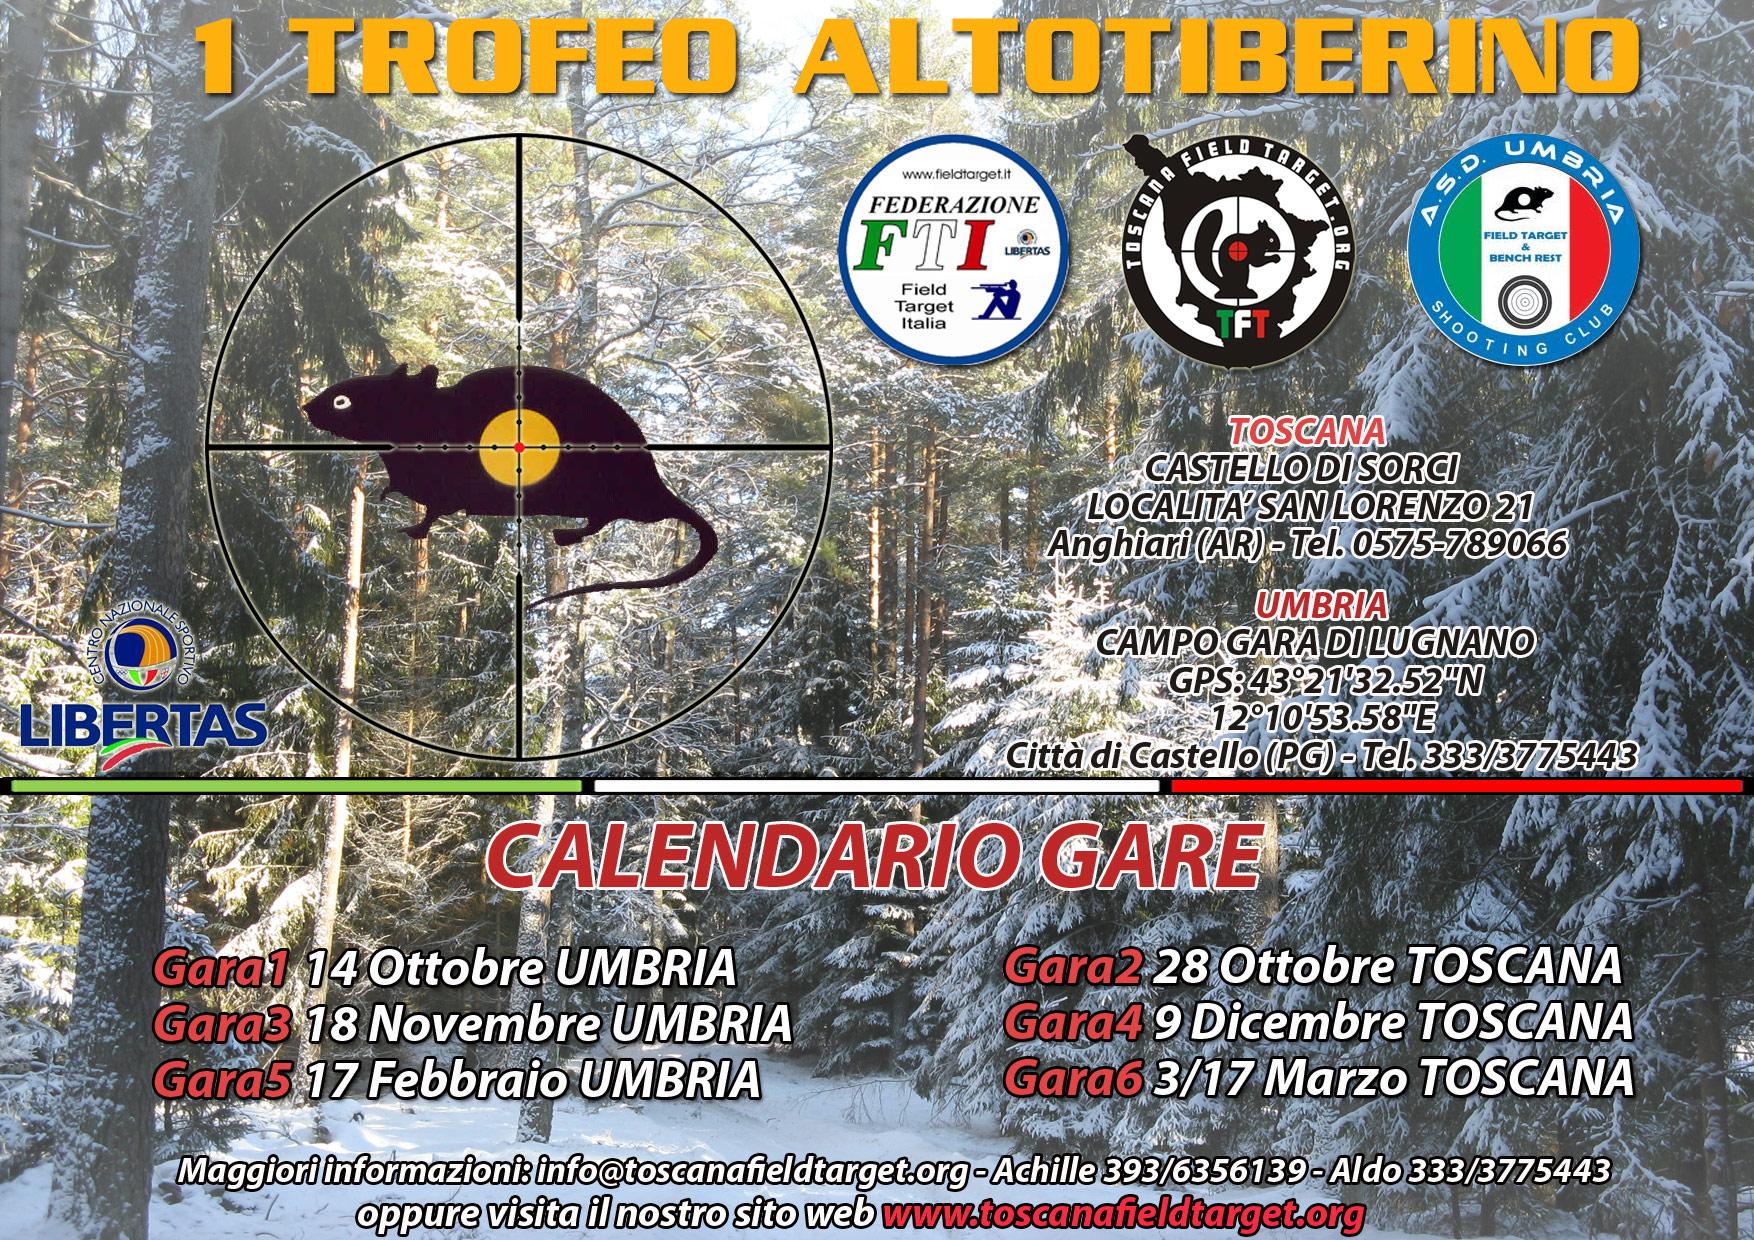 20121130201547_altotiberino1